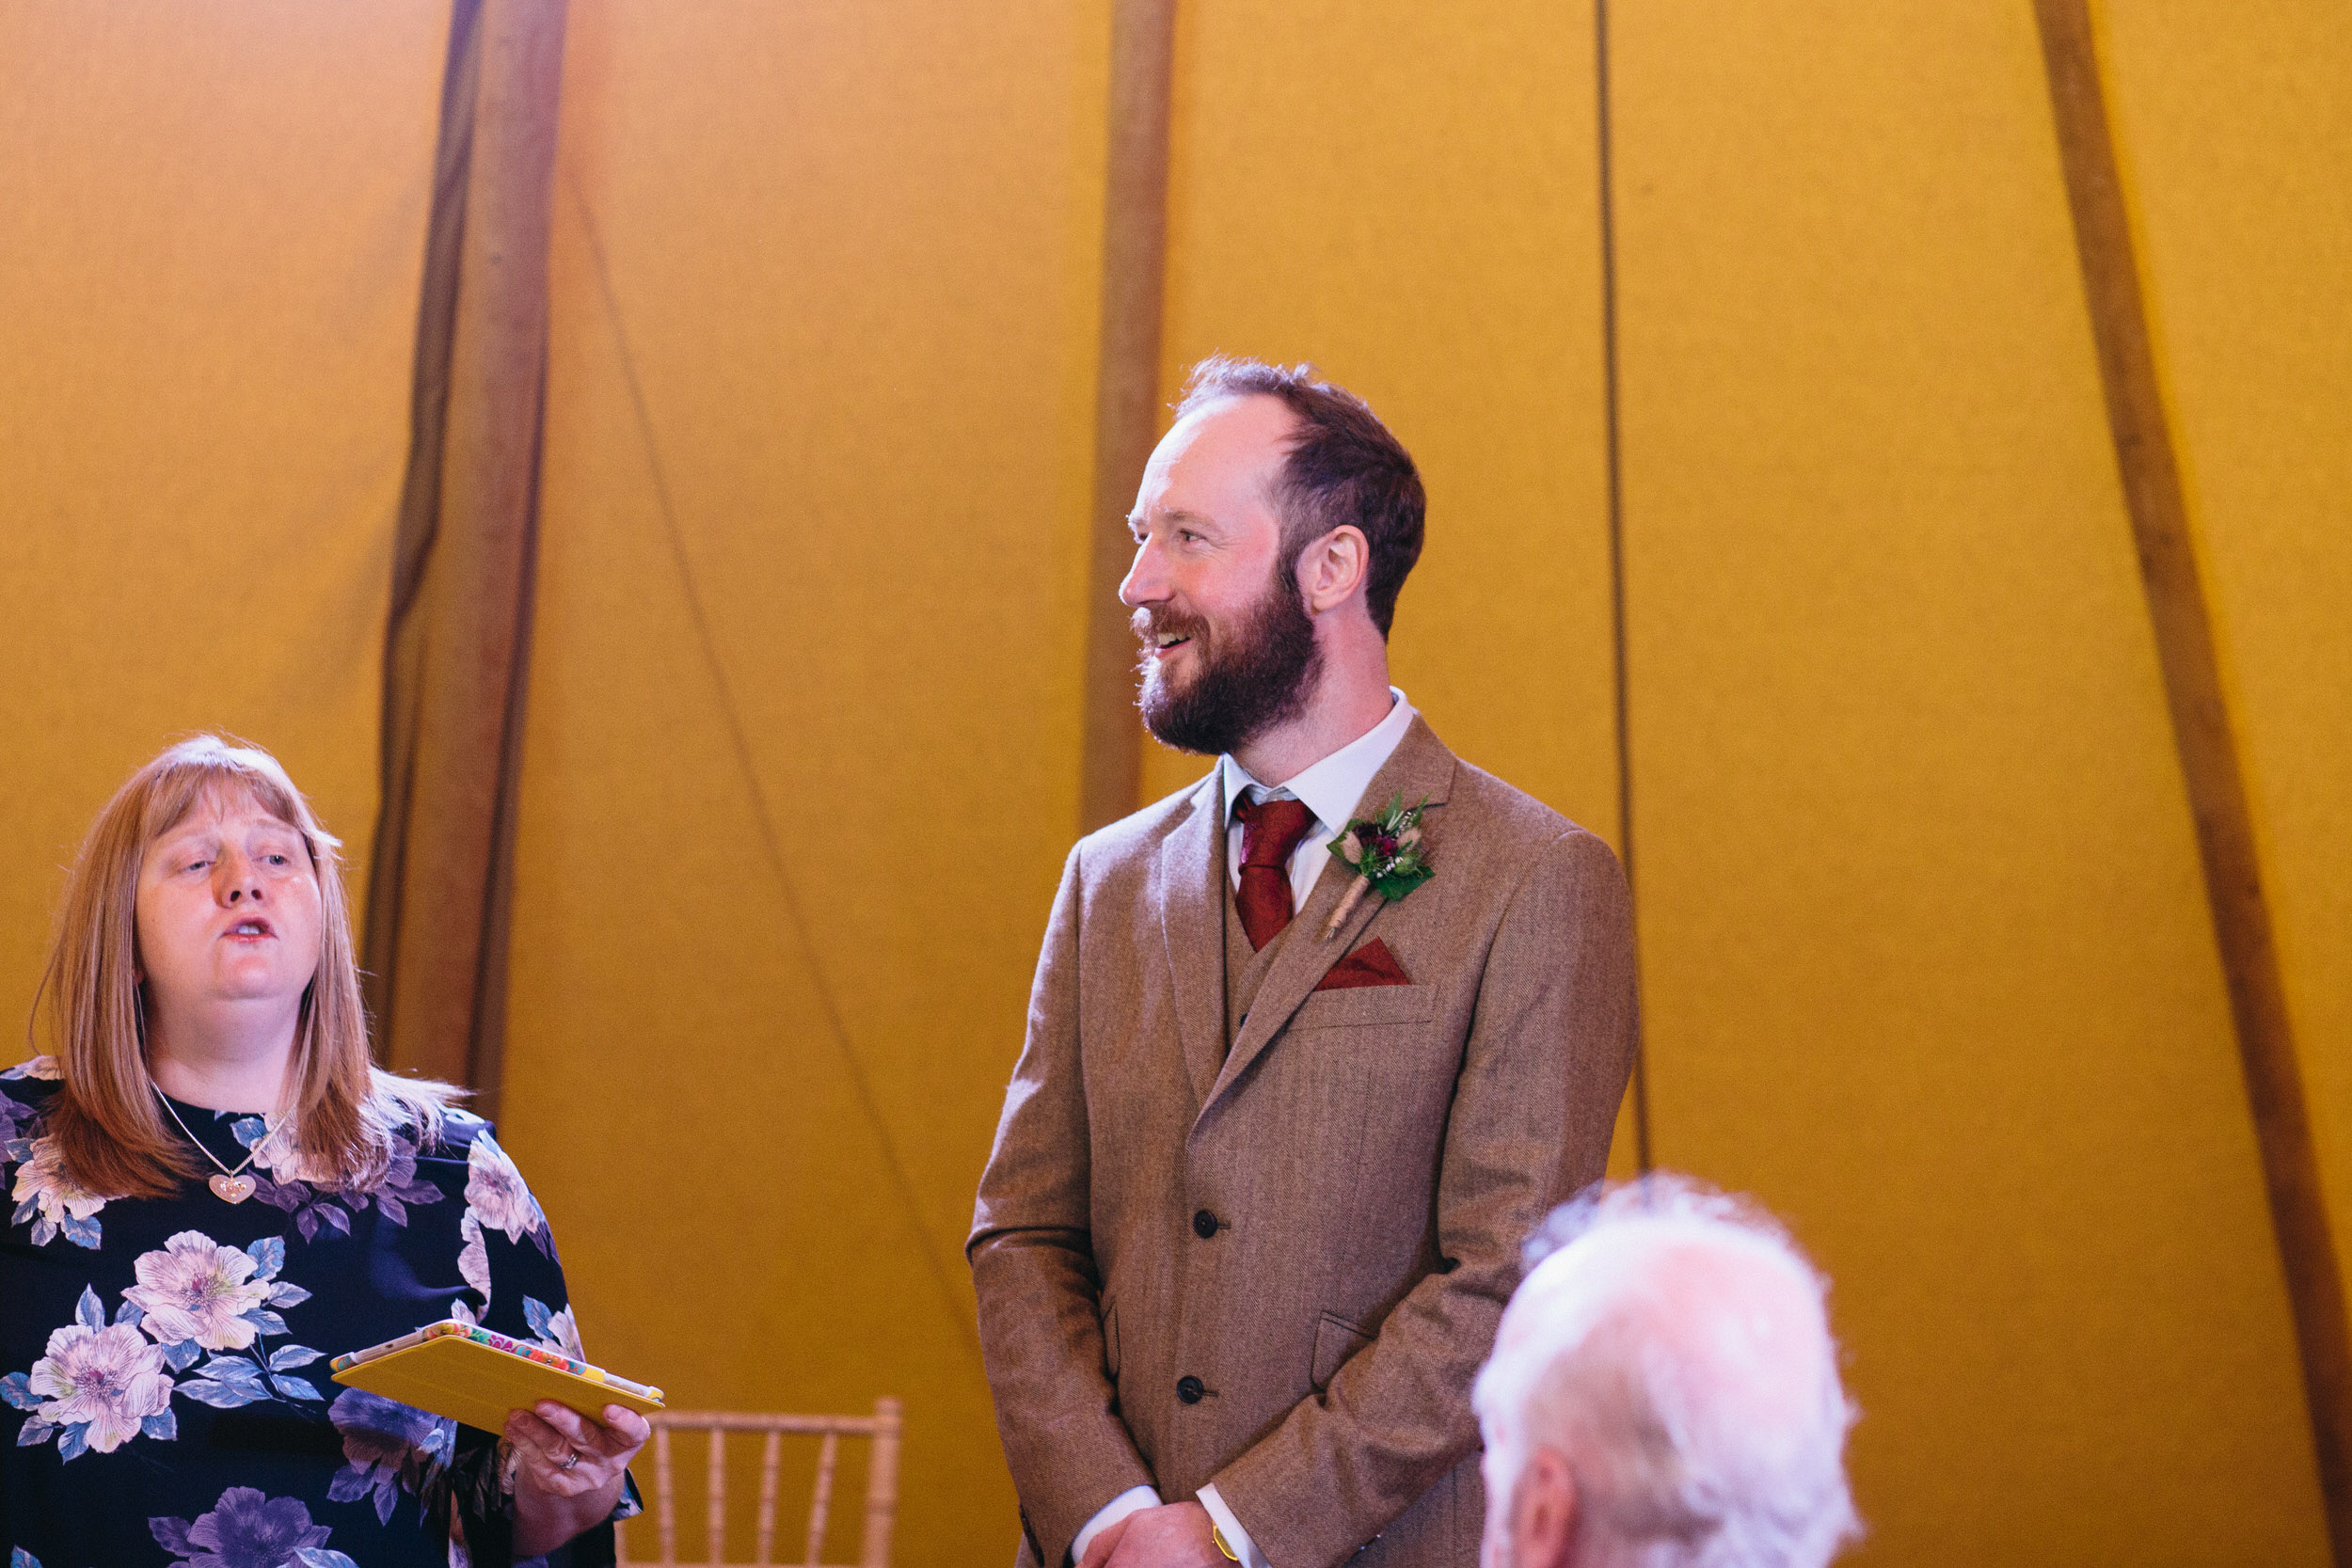 Quirky Wedding Photography Scotland Borders Biggar Hartree 031.jpg